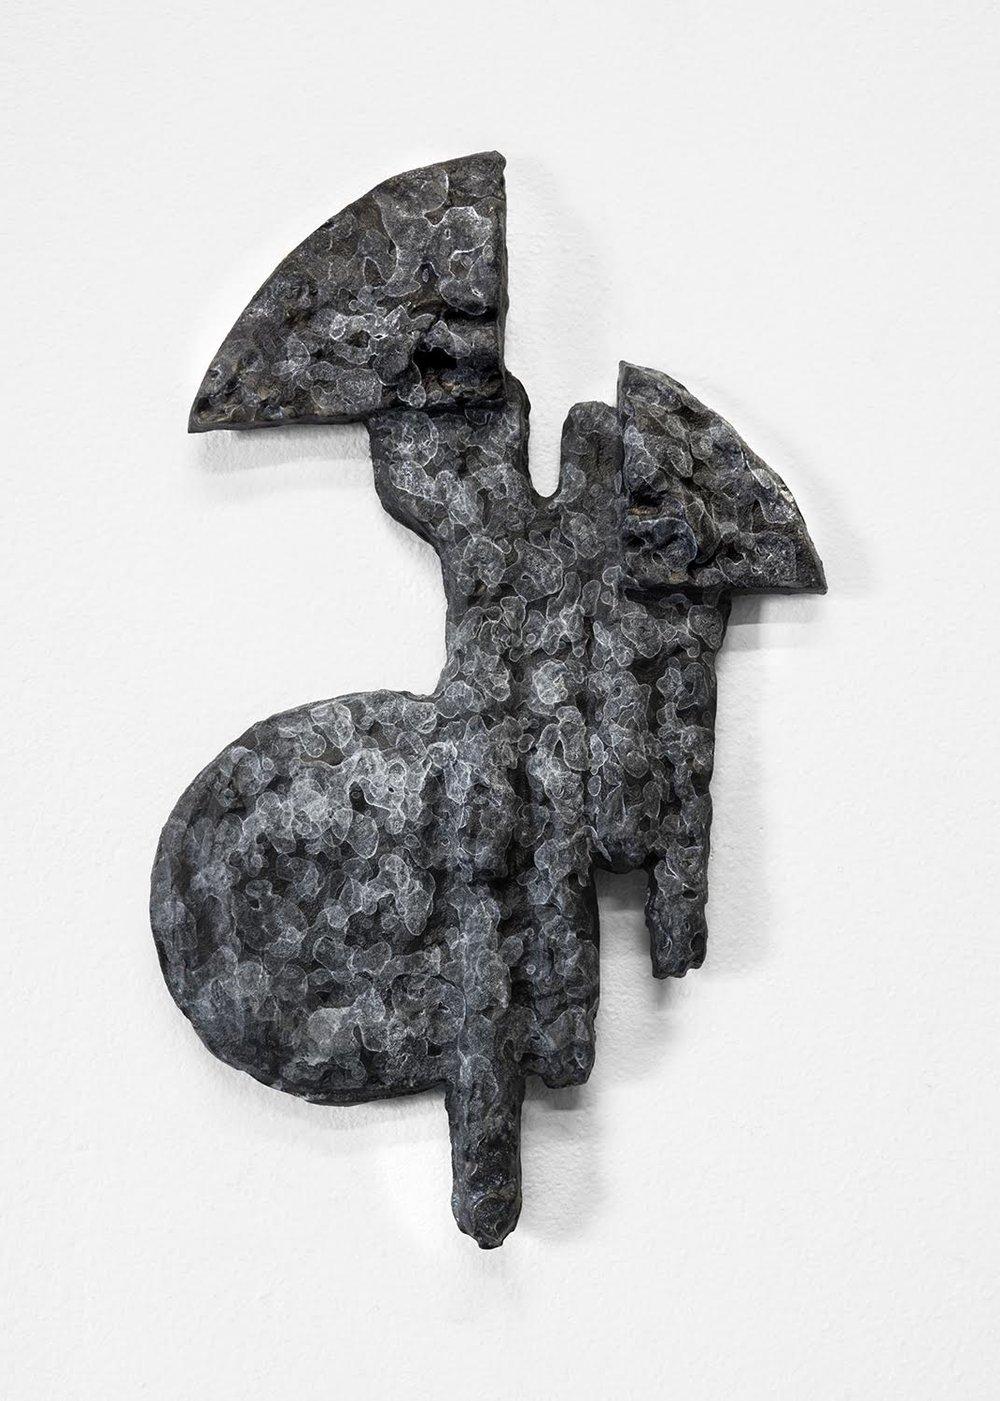 CAMBRIAN VISTAS II bronze with patina, 2016